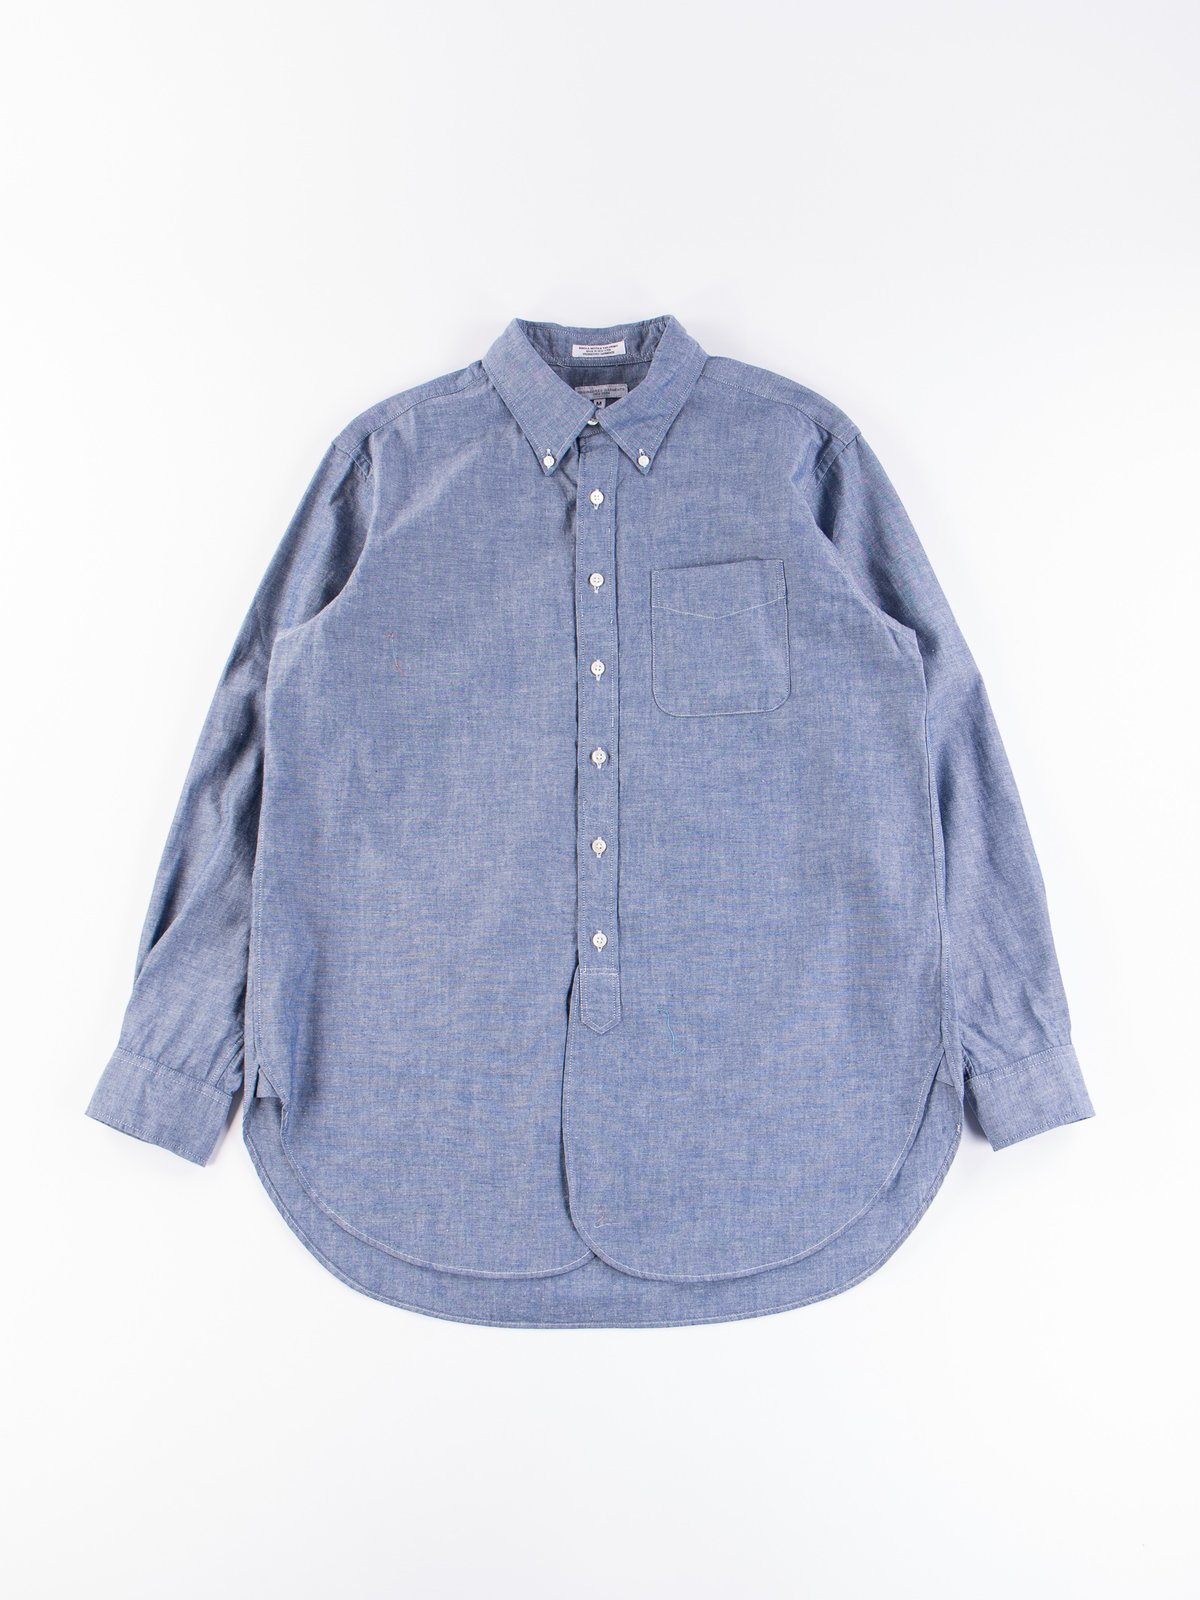 Blue Cotton Chambray 19th Century BD Shirt - Image 1